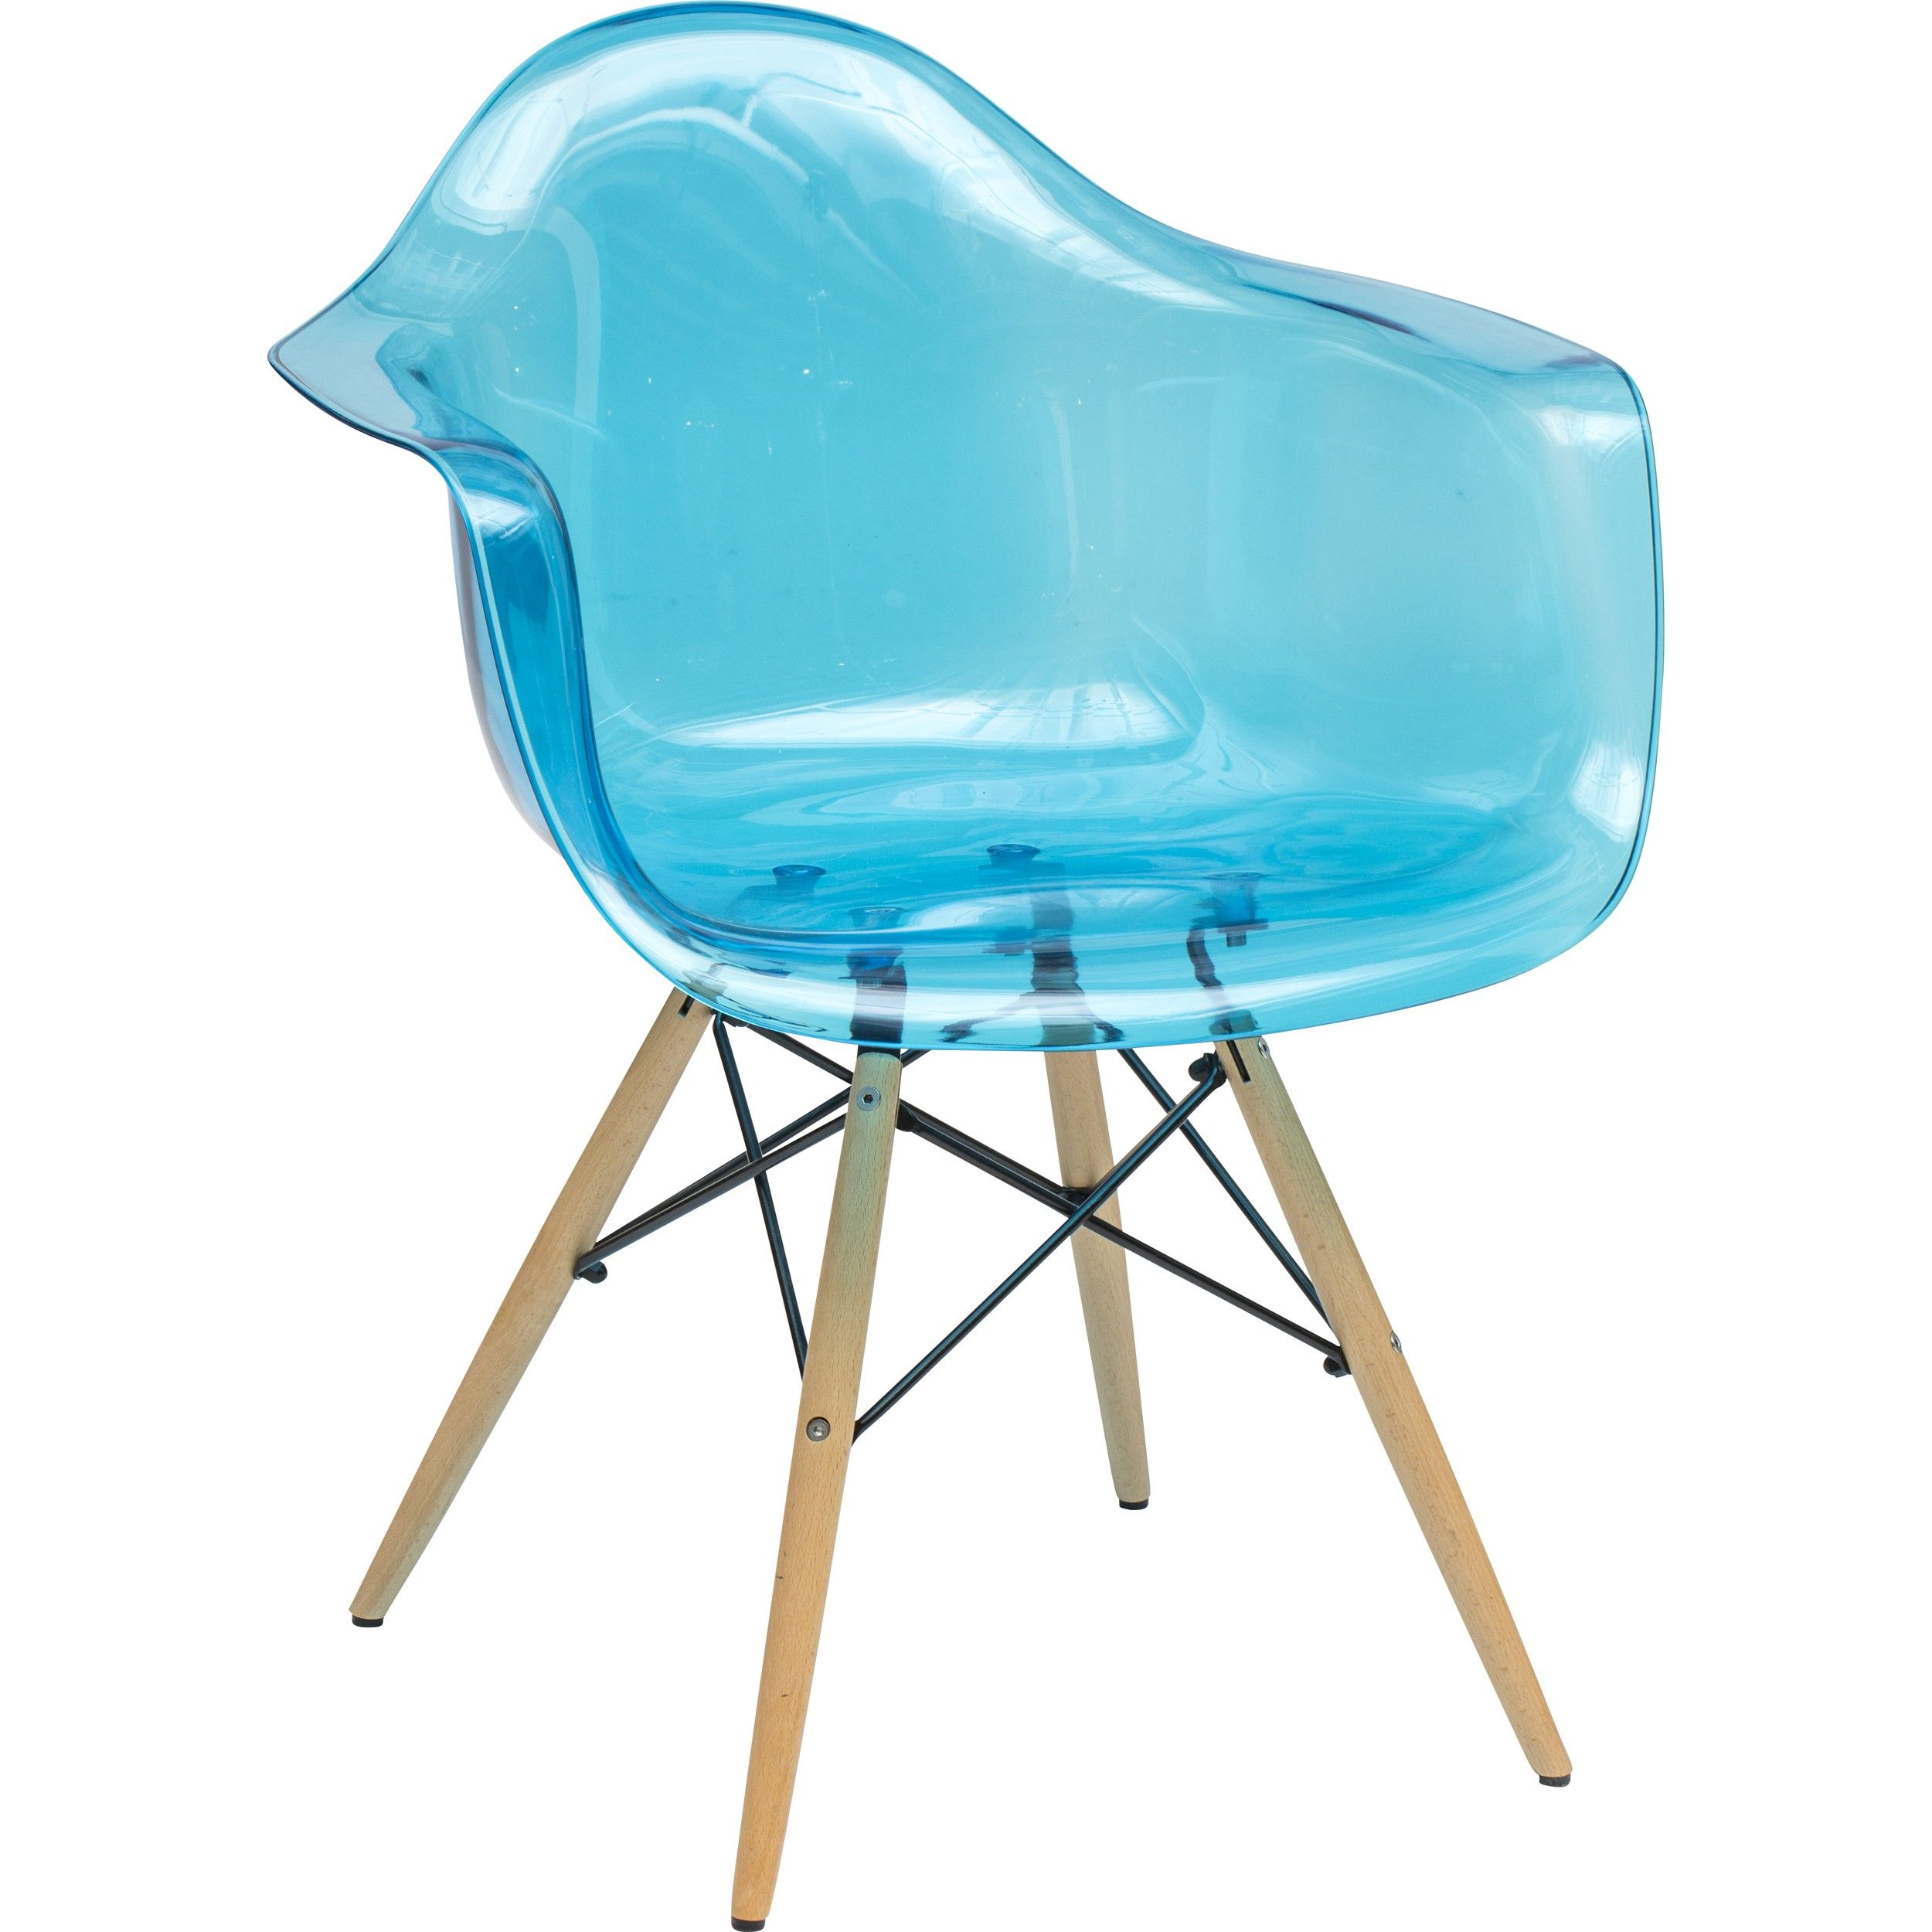 Declan Teal Blue Transparent Chair W Wood Leg Transparent Chair